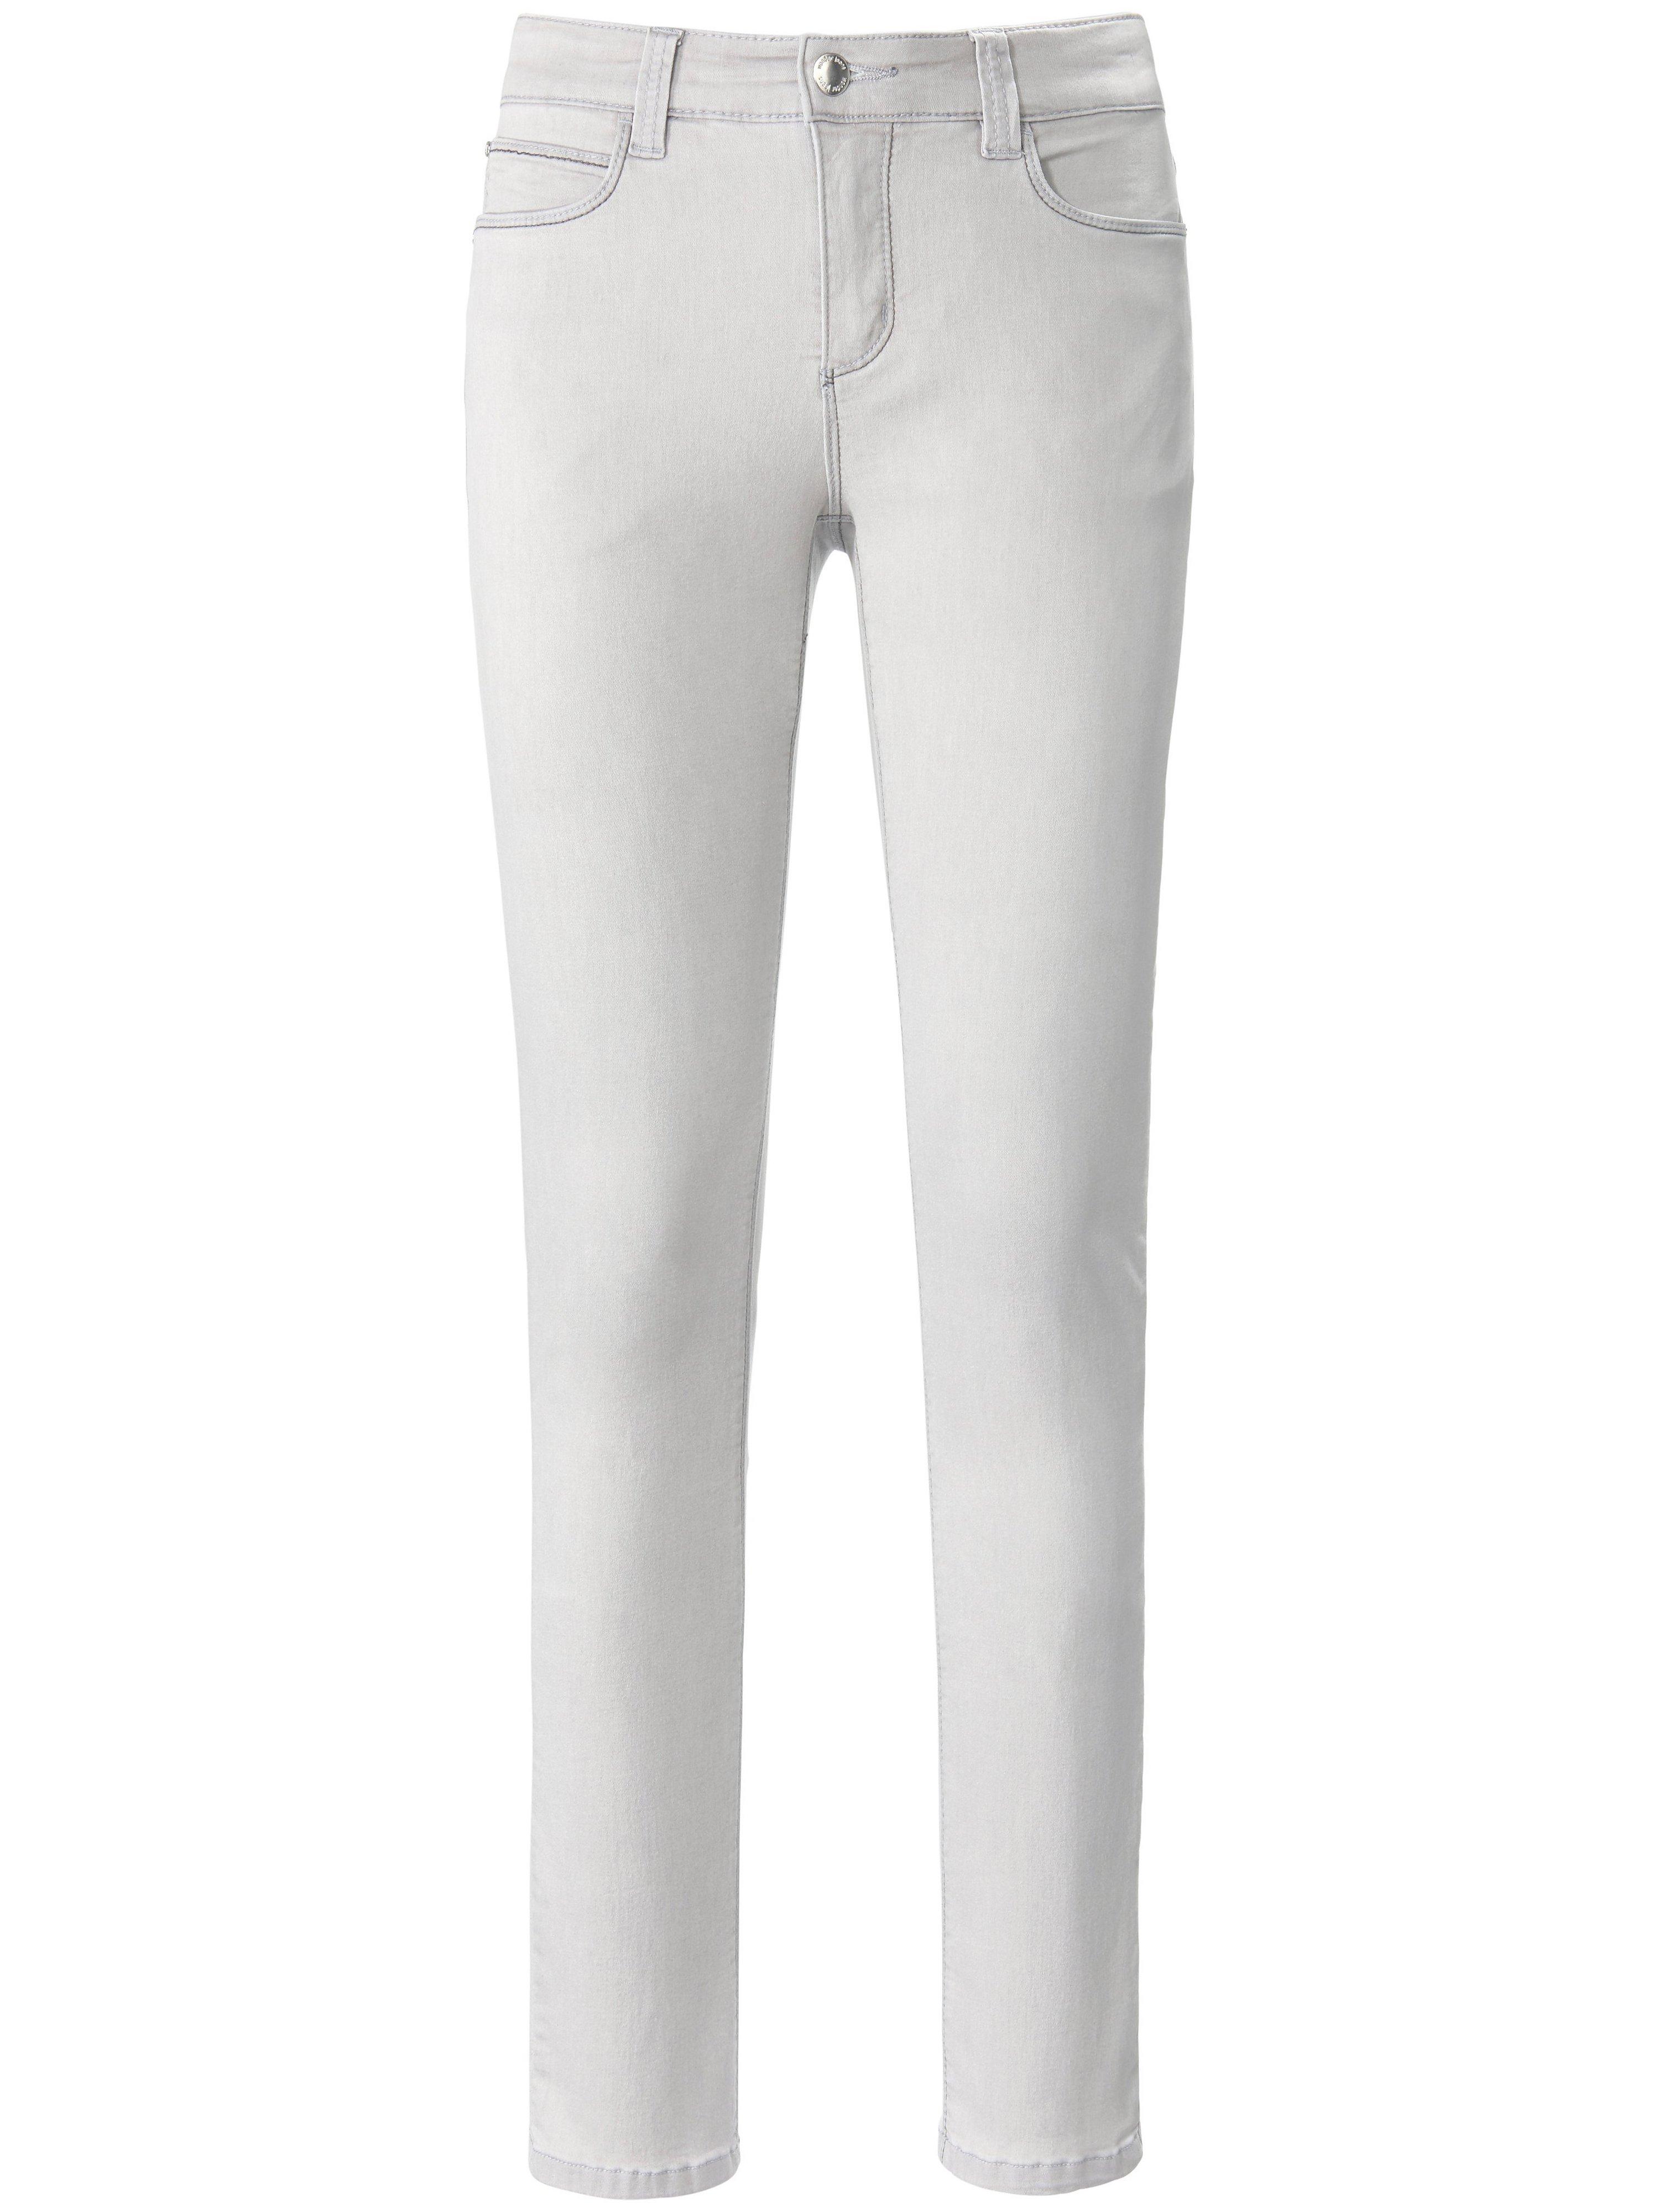 Wonderjeans in 5-pocketsmodel Van Looxent grijs